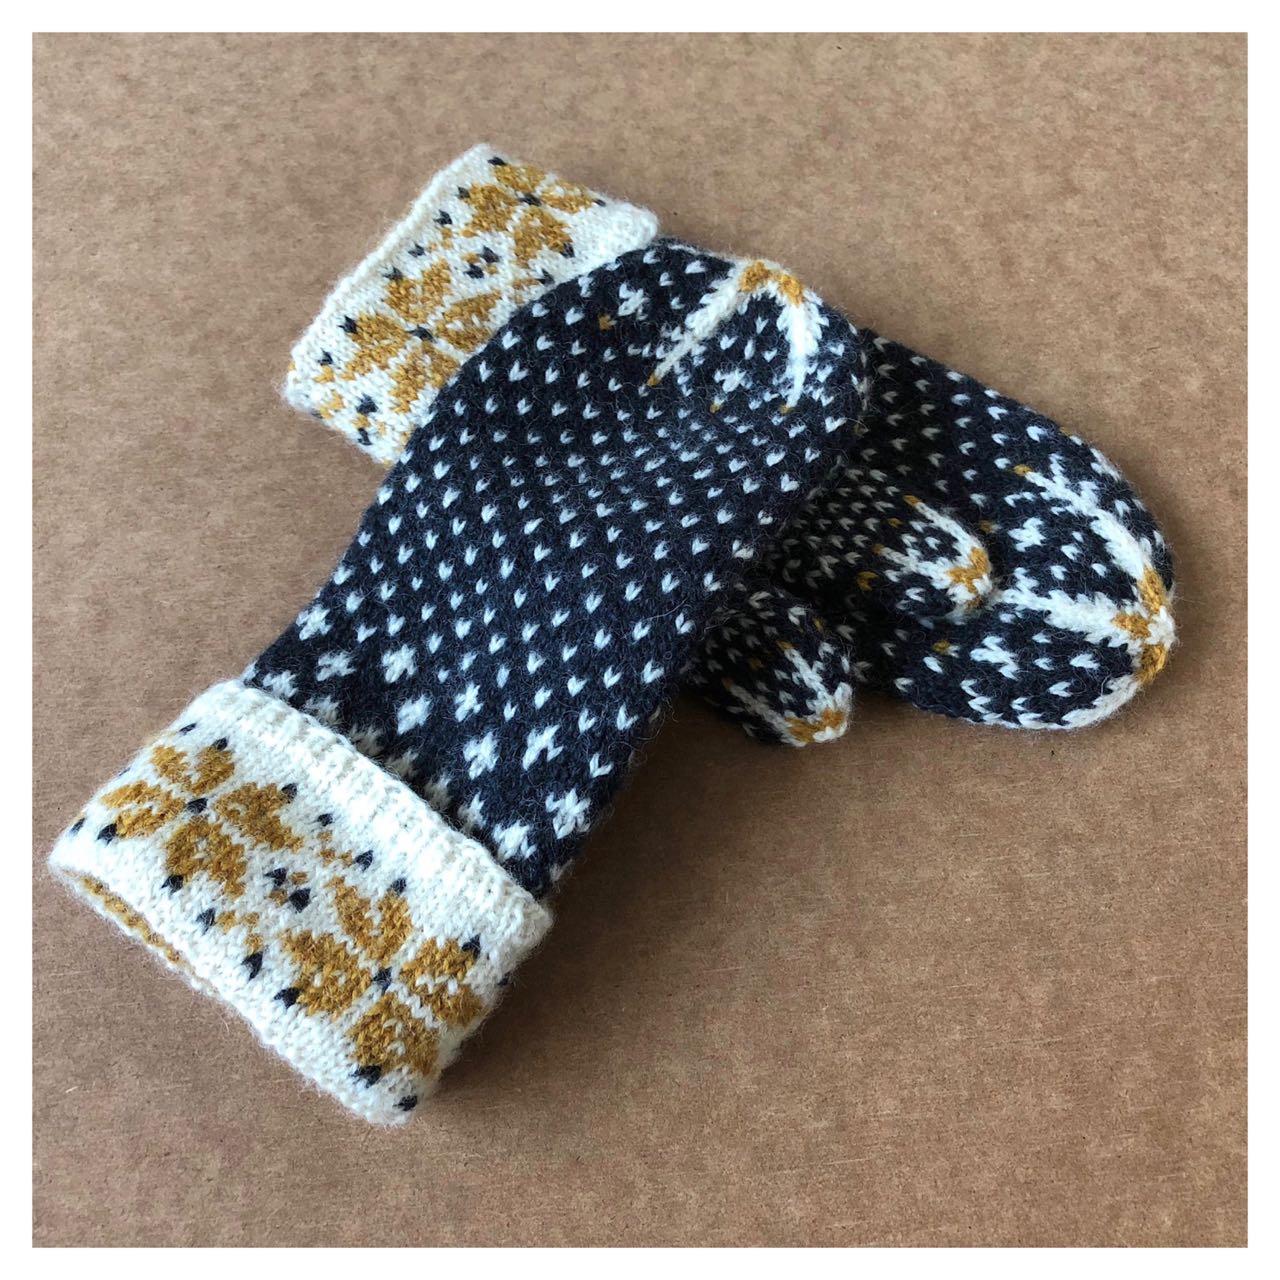 Mīlēt mittens in time for winter